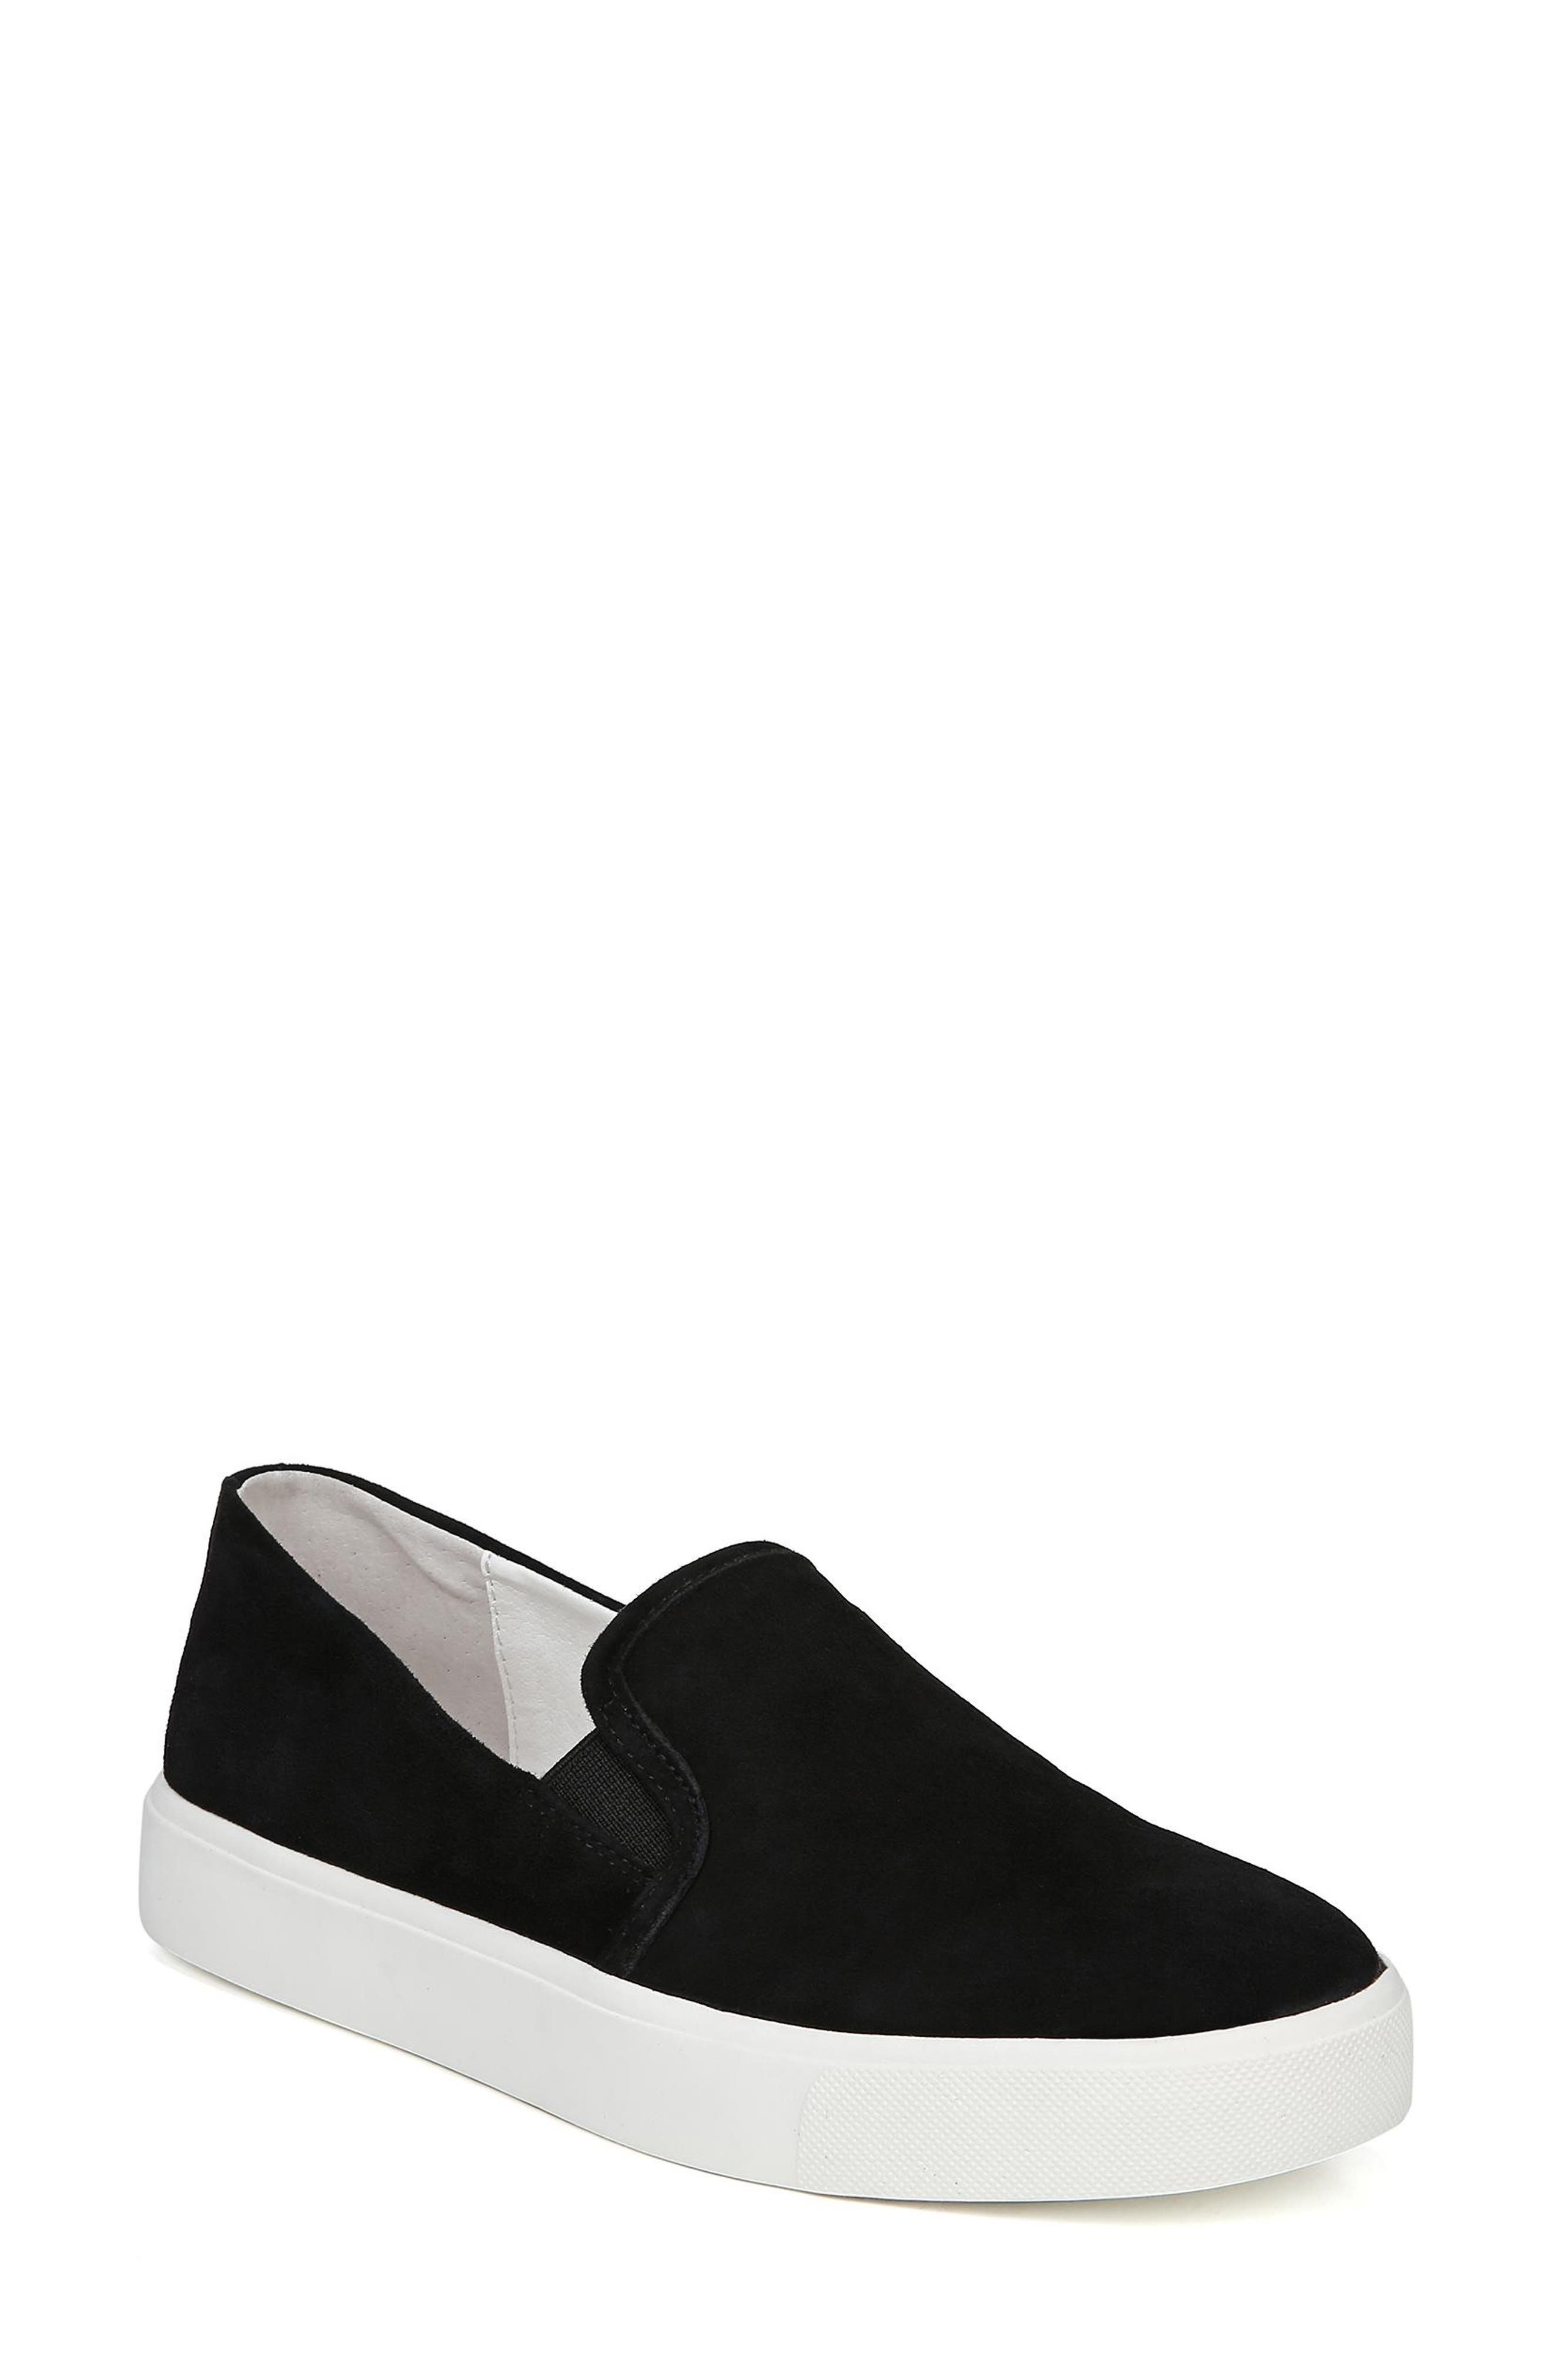 Elton Slip-On Sneaker,                             Main thumbnail 1, color,                             BLACK SUEDE LEATHER